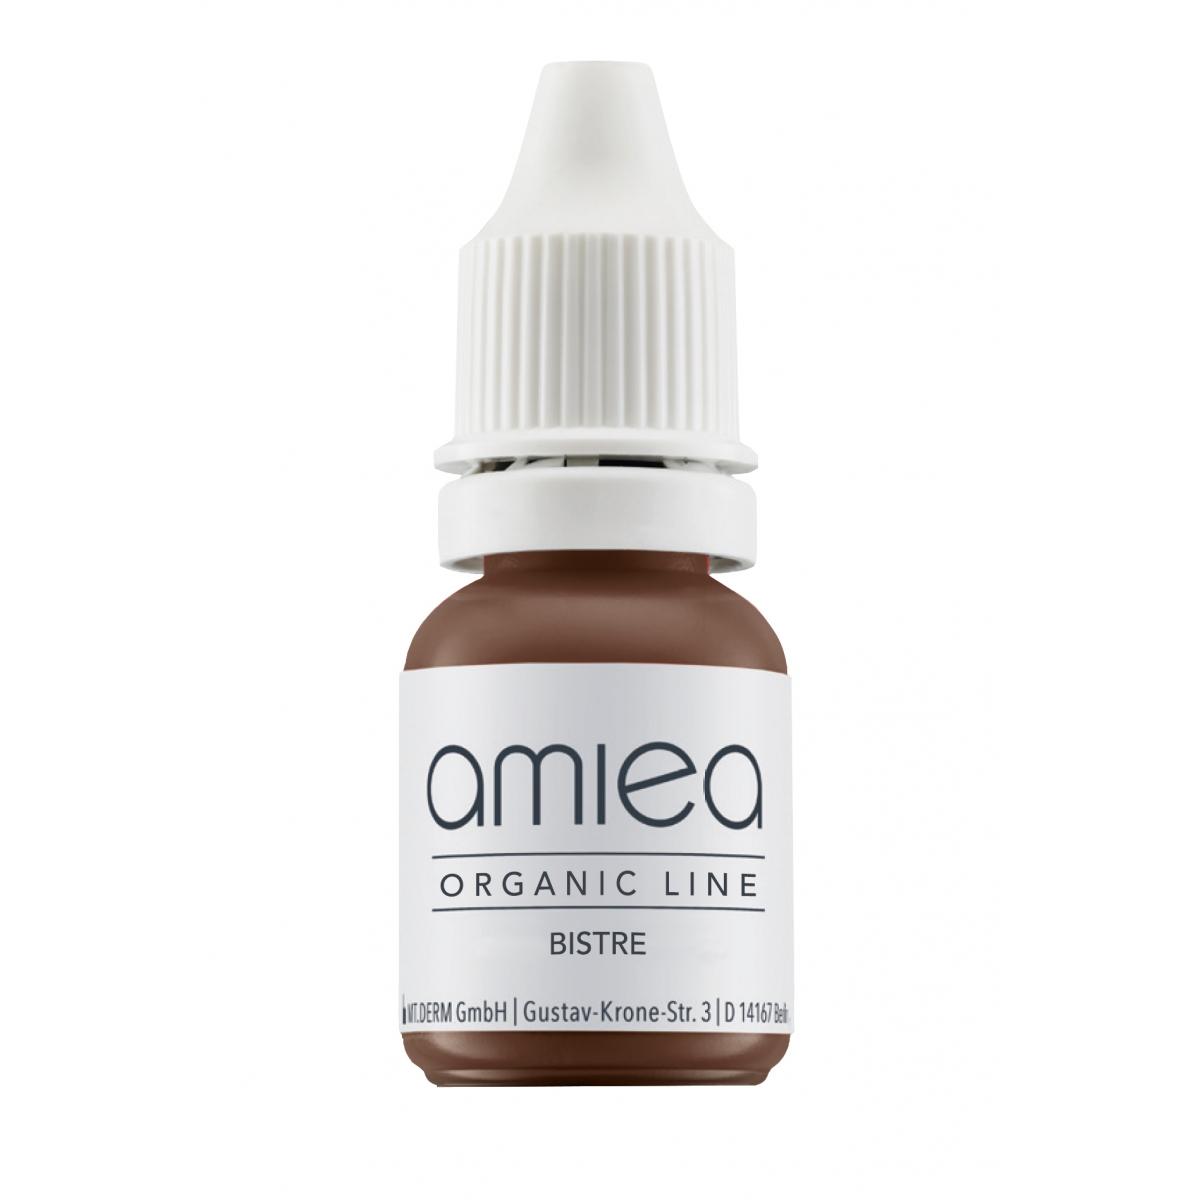 ORGANIC LINE (5ml)  - PIGMENT BISTRE ORGANICLINE AMIEA (5 ml)